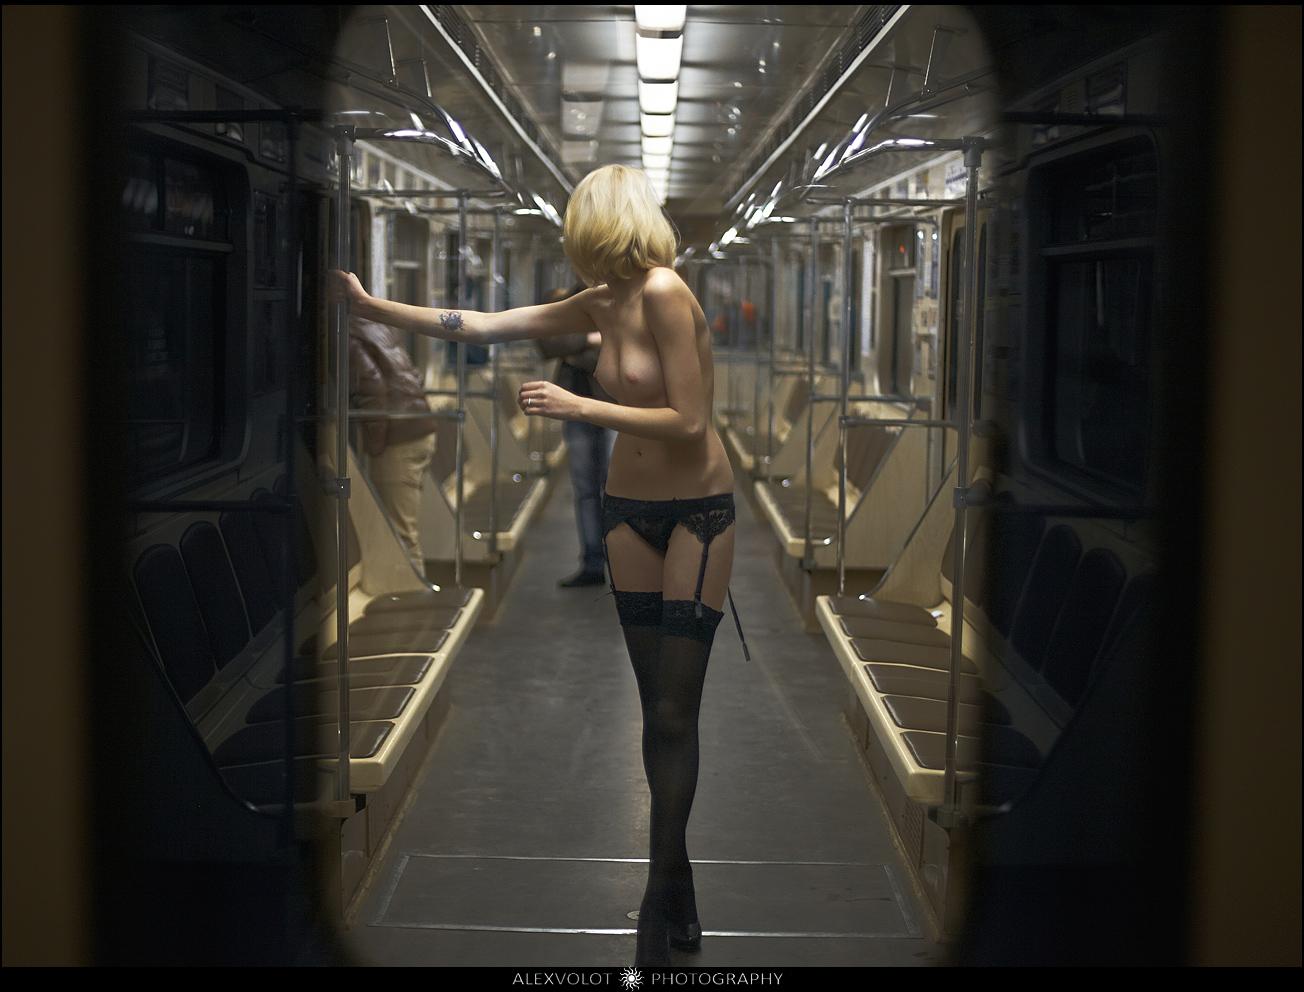 Хентай в вагоне метро 3 фотография